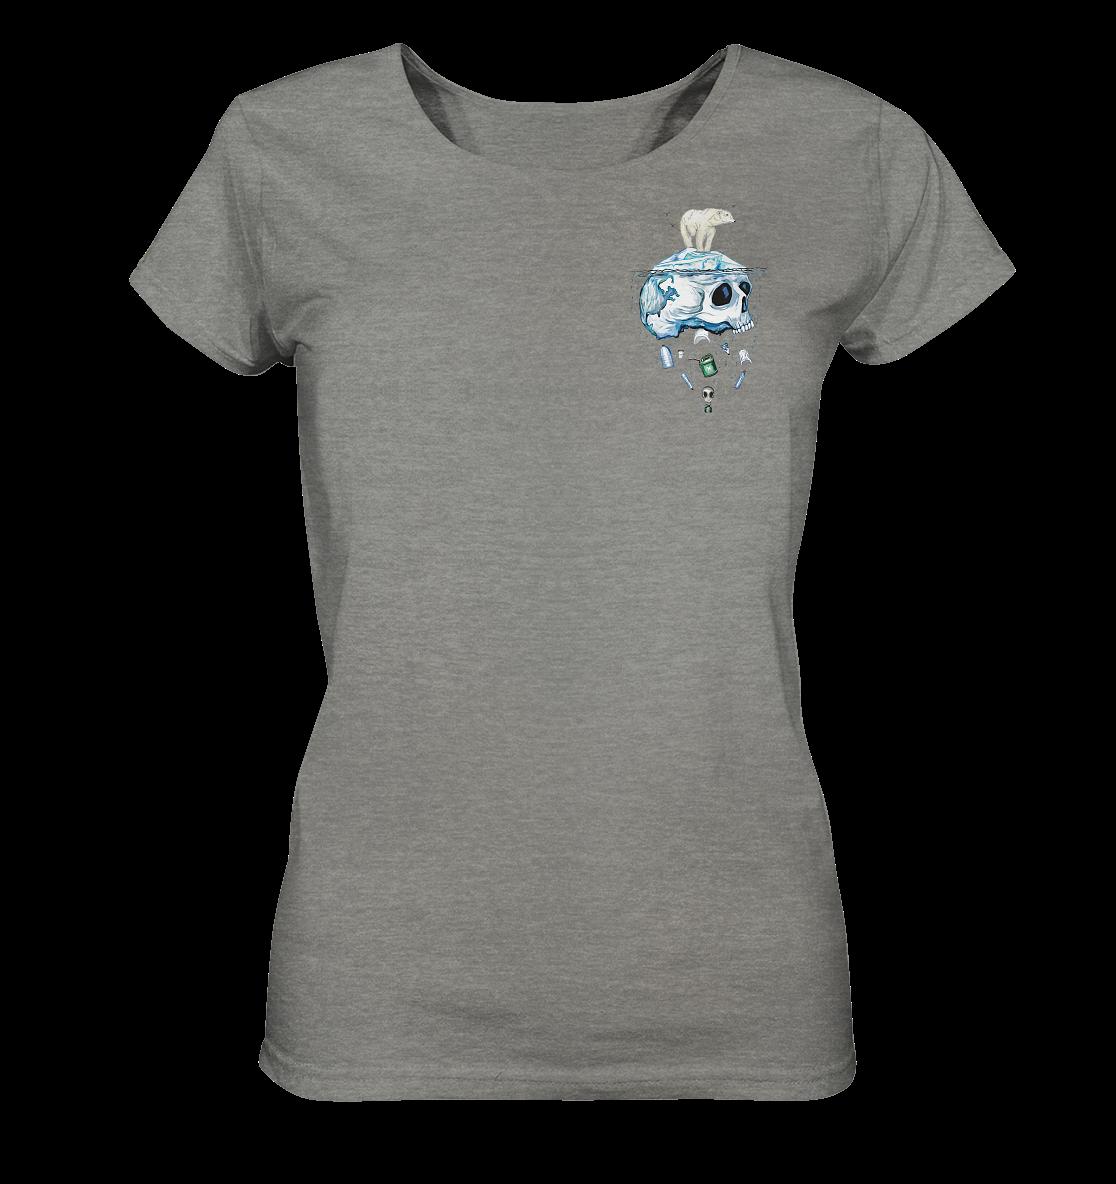 front-ladies-organic-shirt-meliert-818381-1116x-3.png